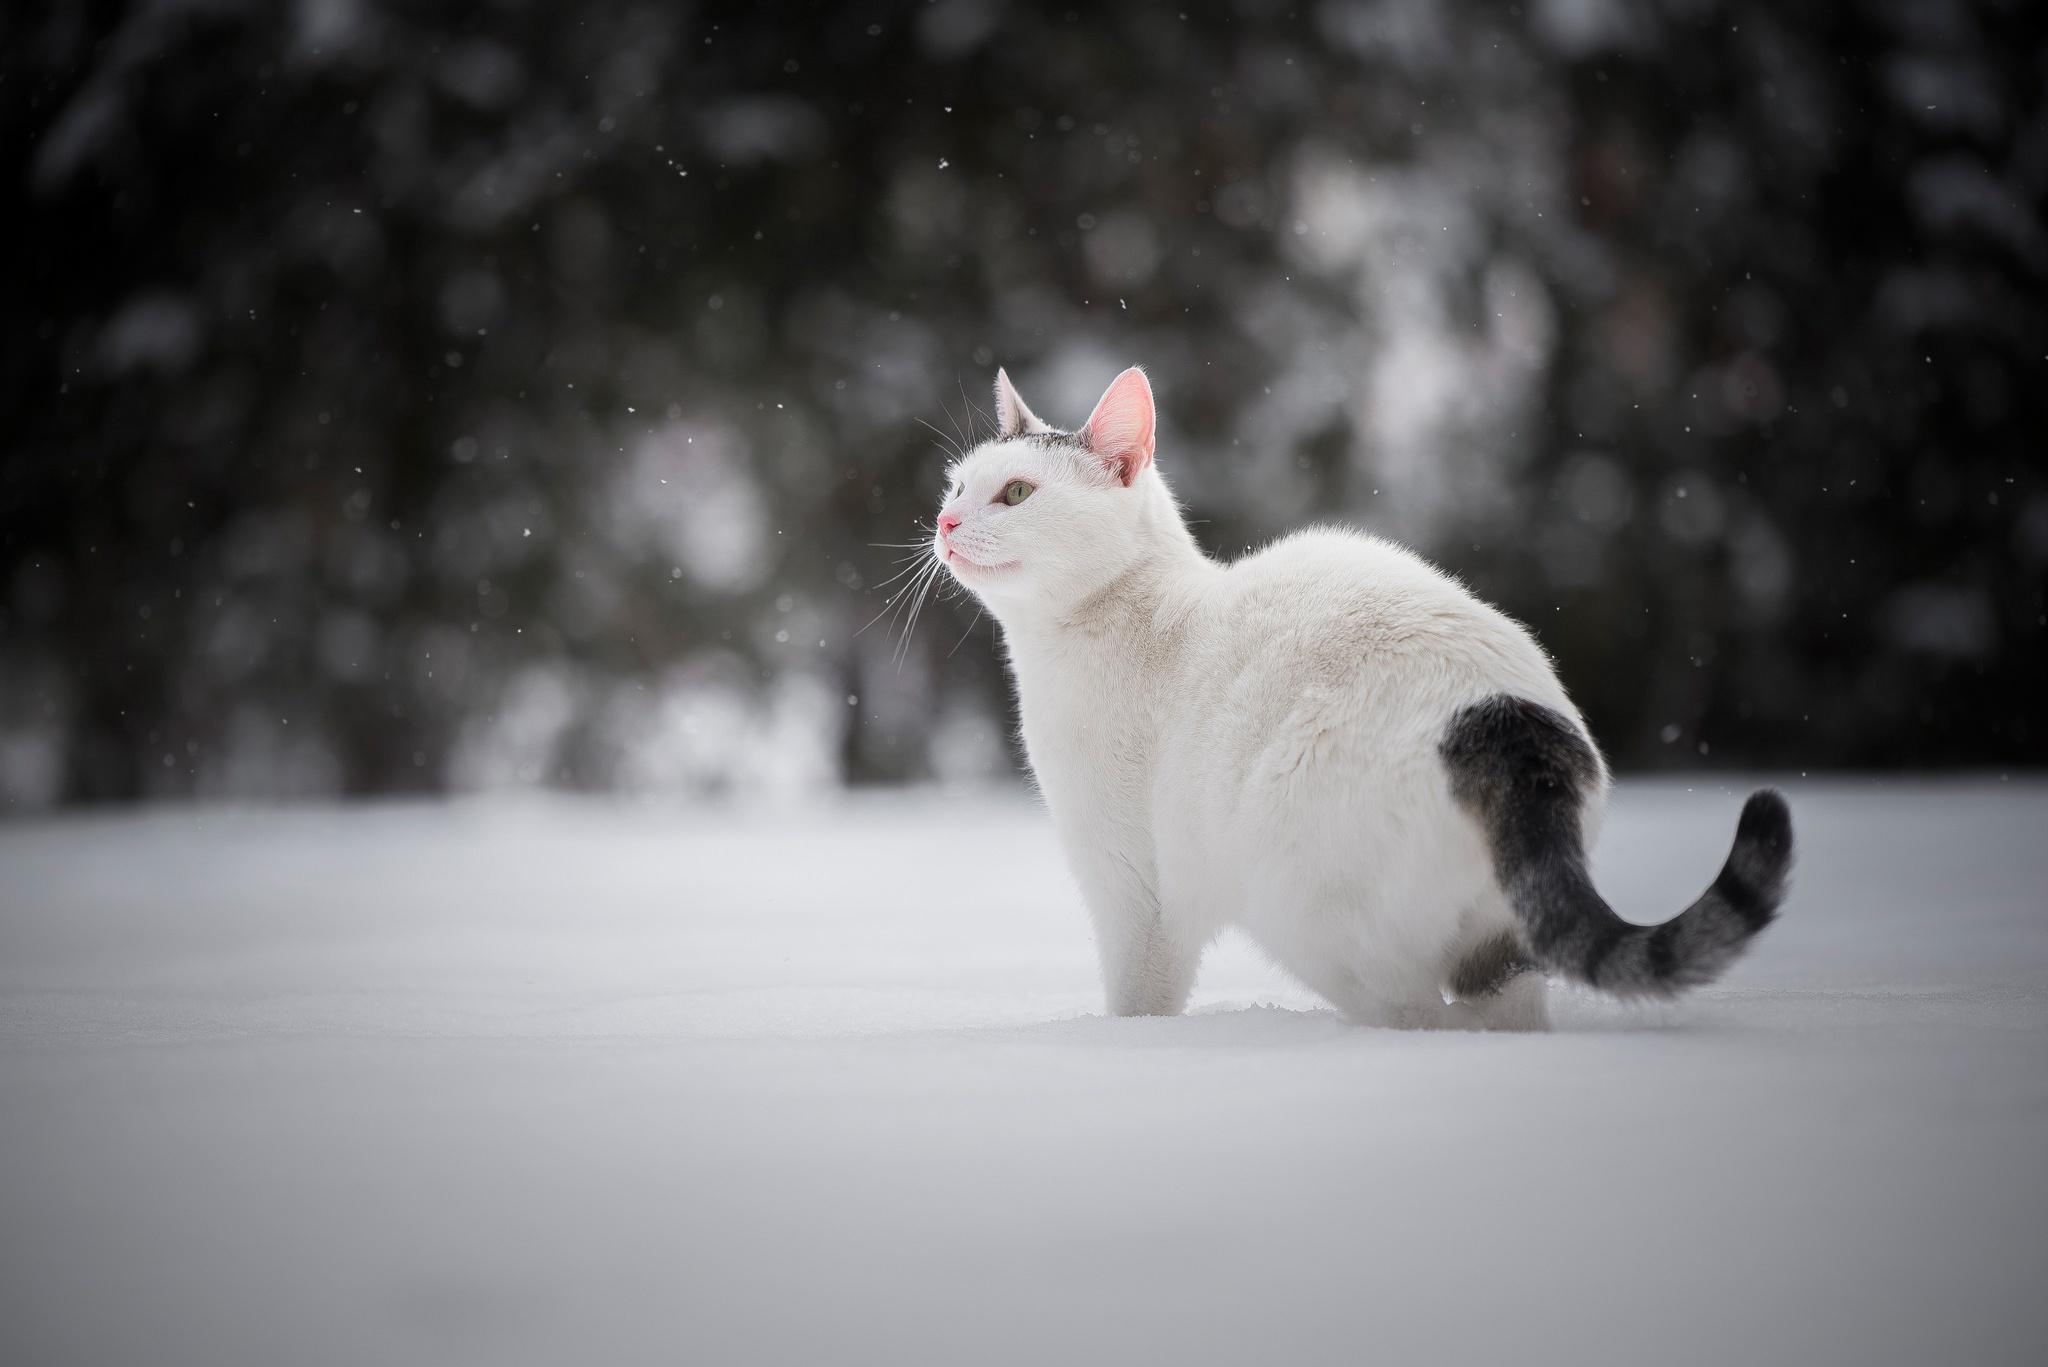 Cat Pet Winter 2048x1367